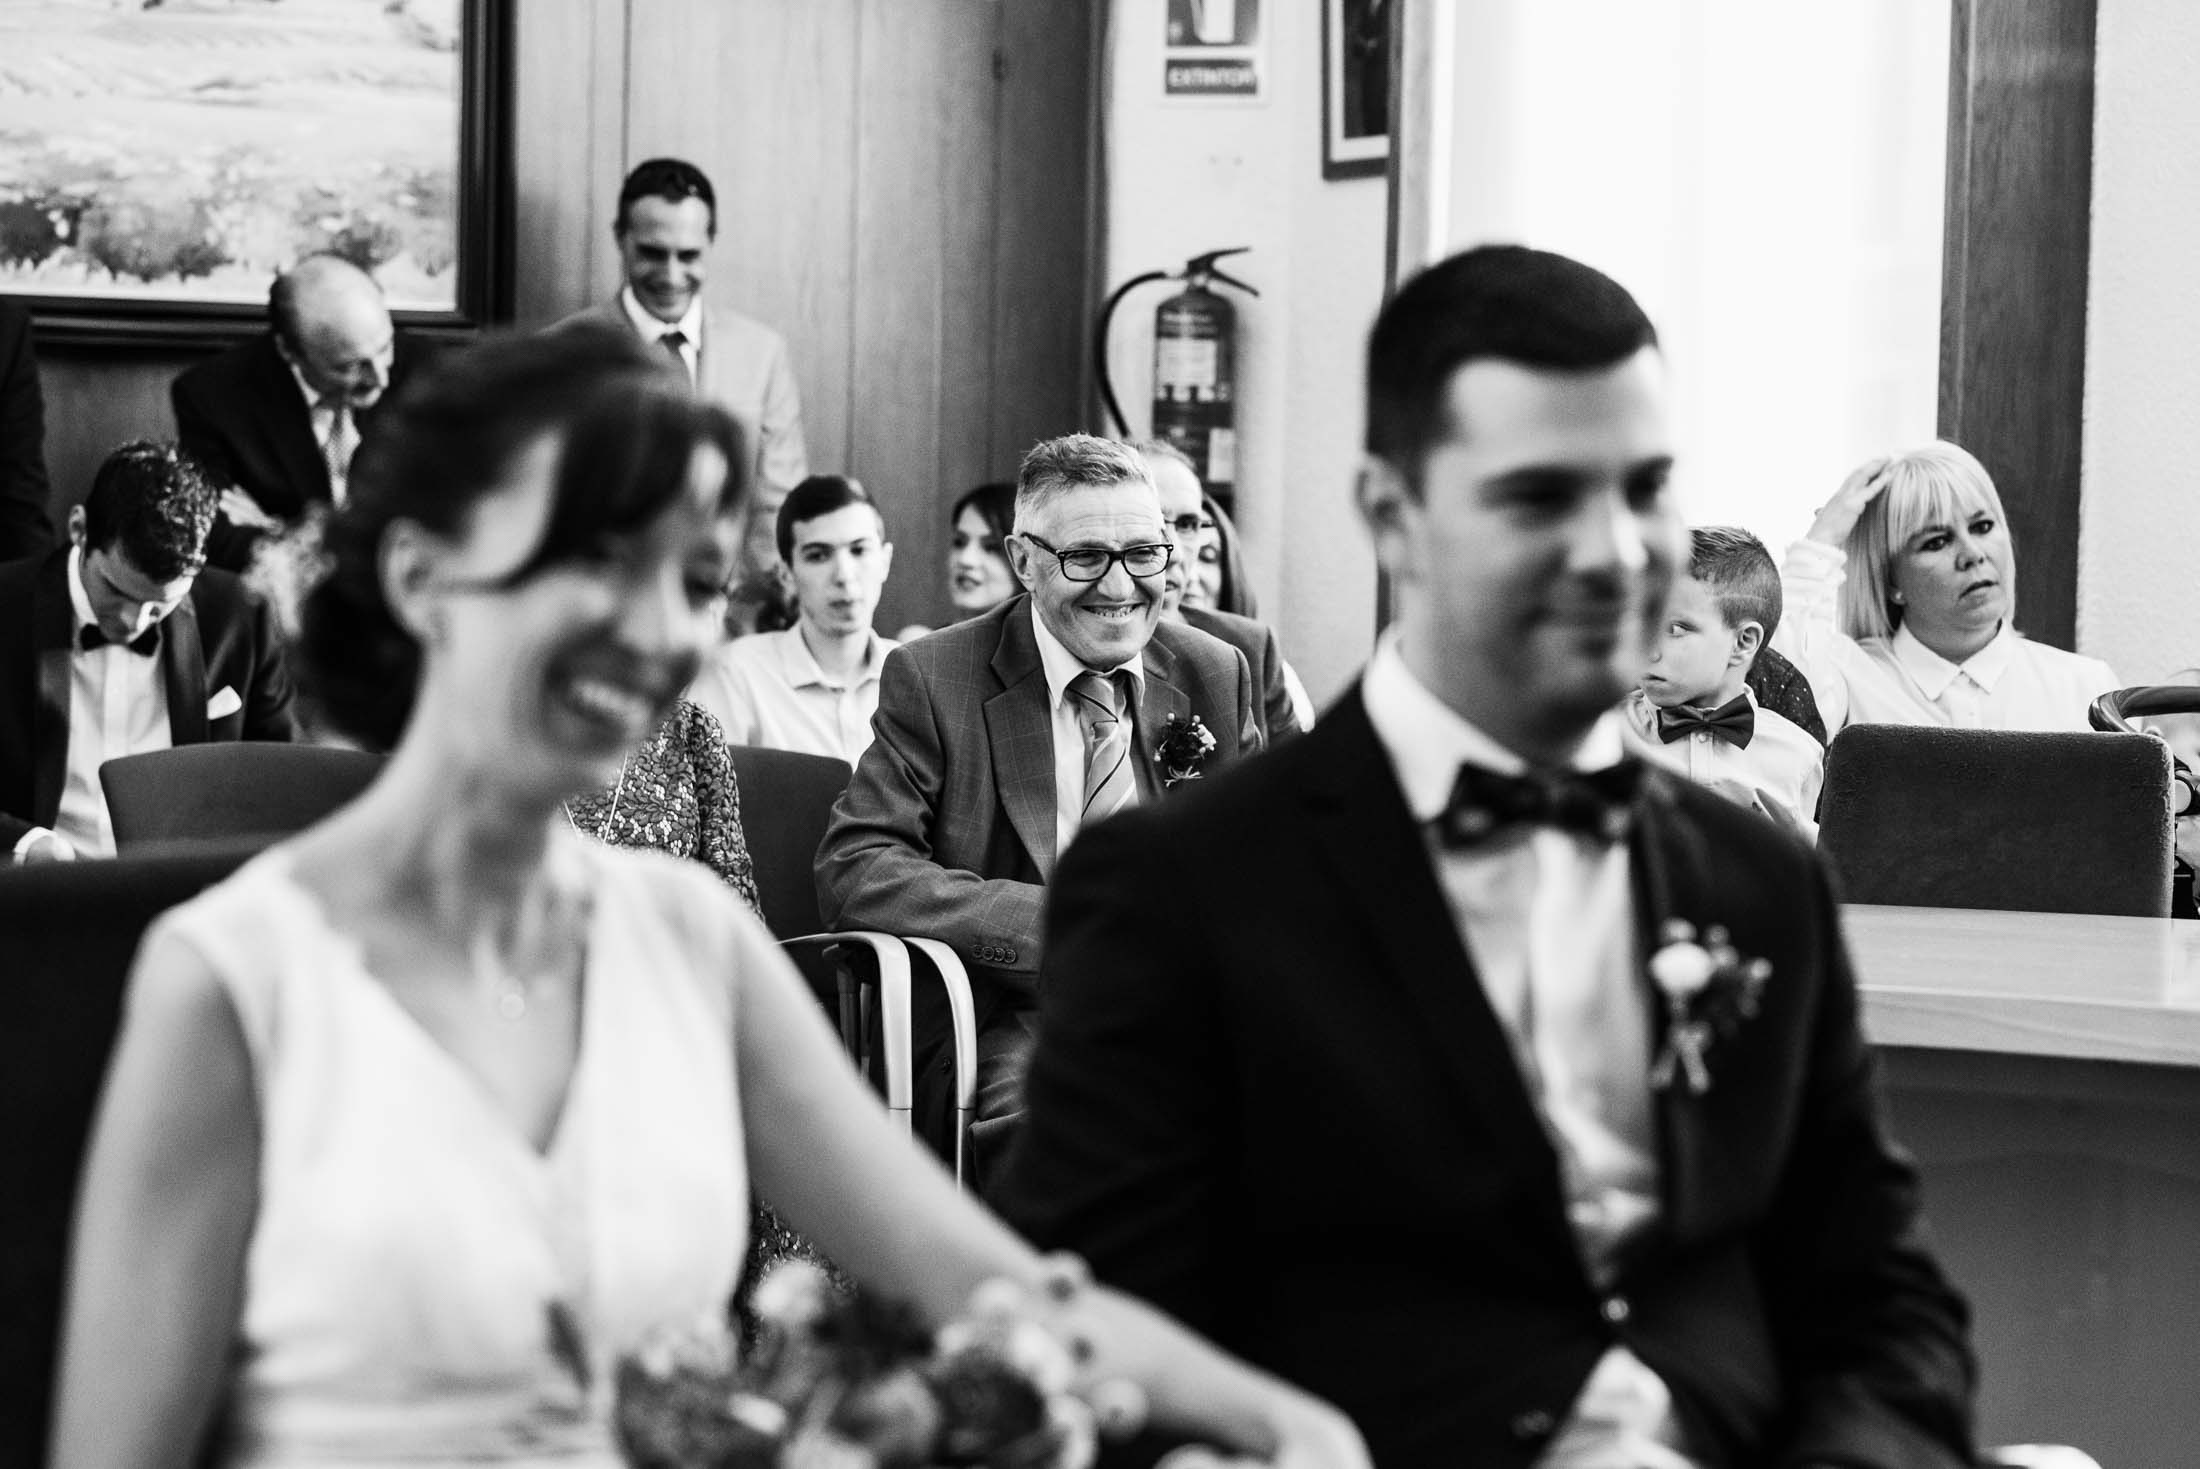 Fotoperiodismo de boda y fotografia documental